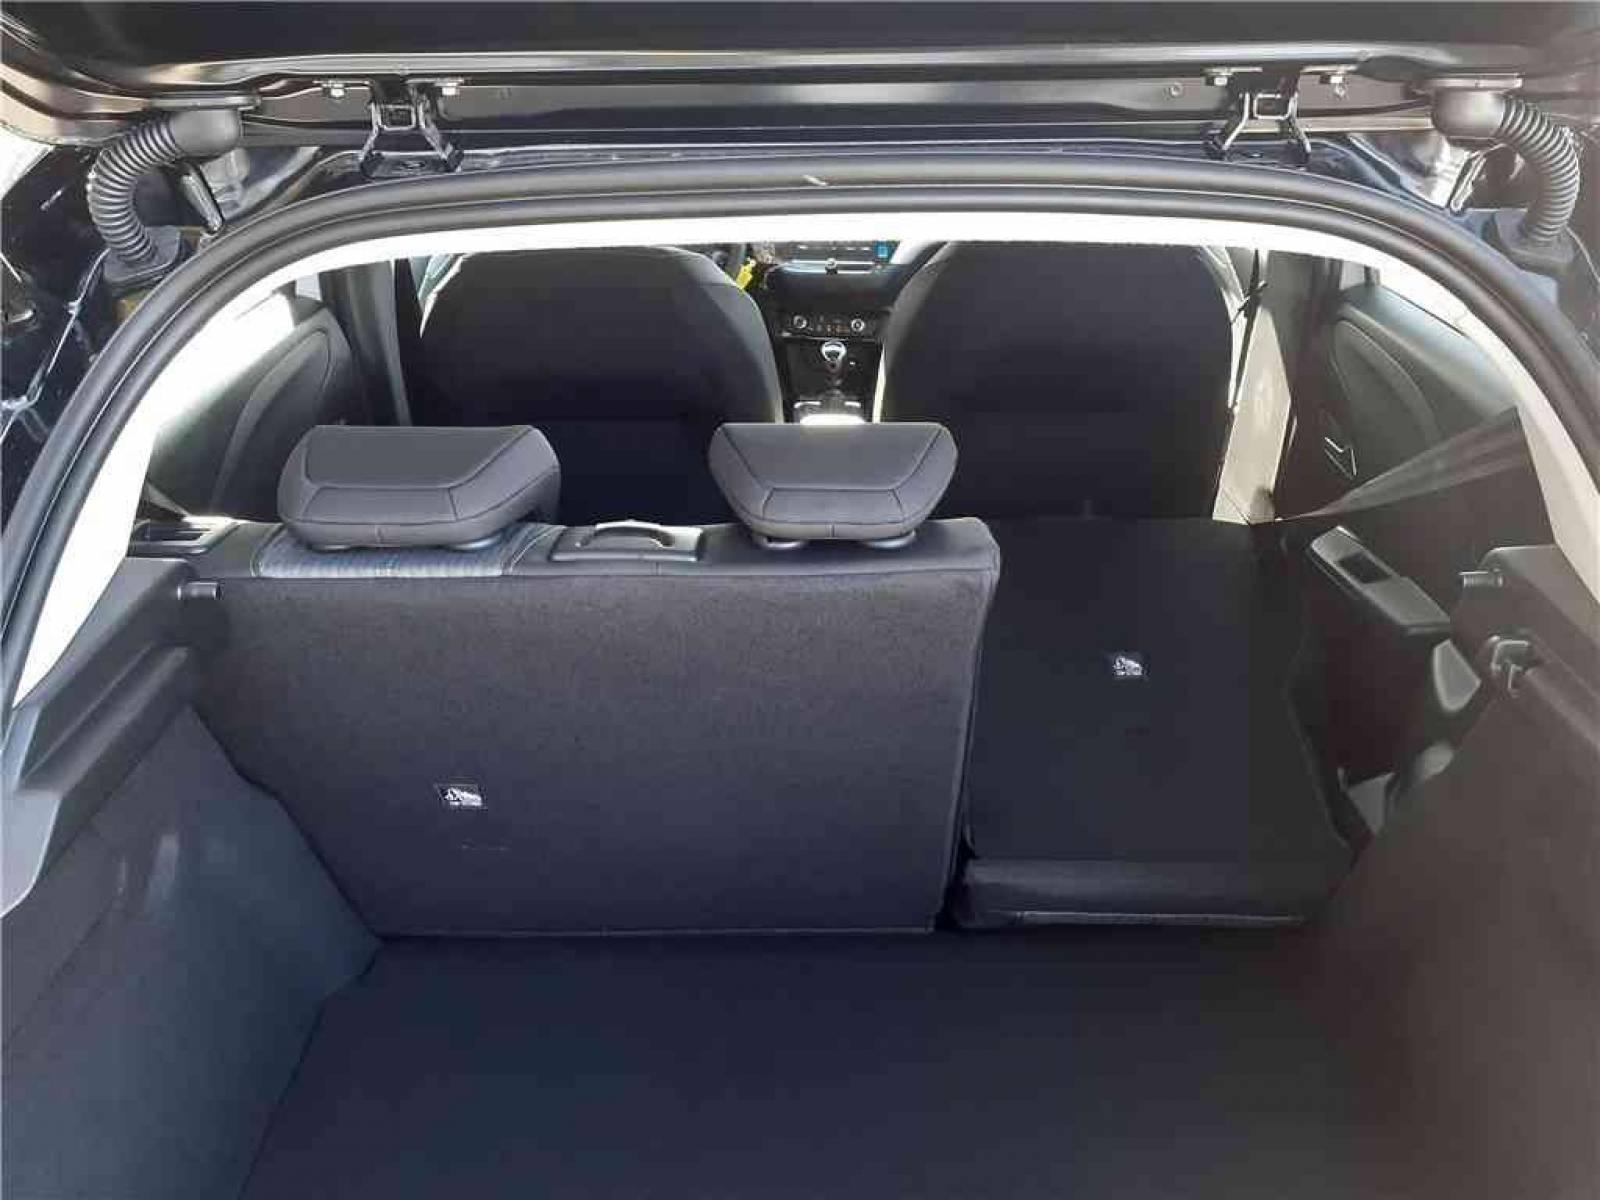 OPEL Corsa 1.2 Turbo 100 ch BVM6 - véhicule d'occasion - Groupe Guillet - Opel Magicauto - Chalon-sur-Saône - 71380 - Saint-Marcel - 11